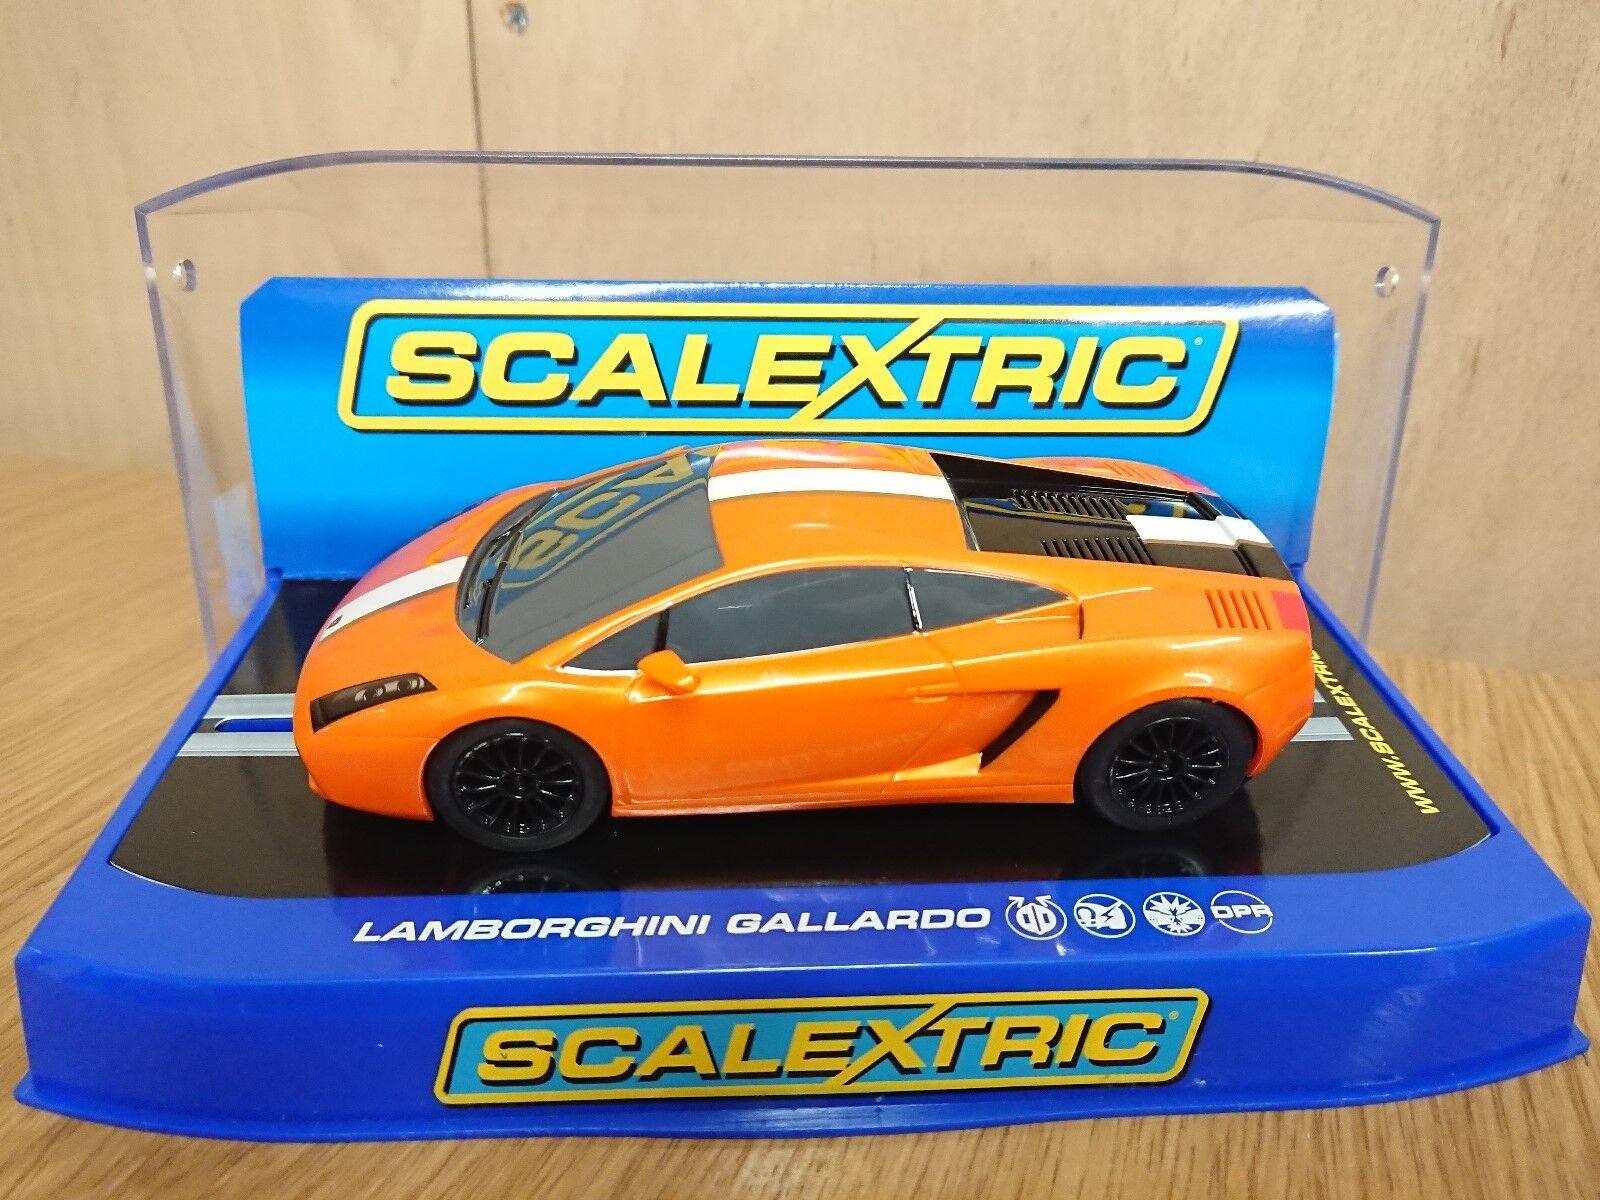 SCALEXTRIC C3178 Lamborghini Gallardo LP 550-2 Valentino Balboni New